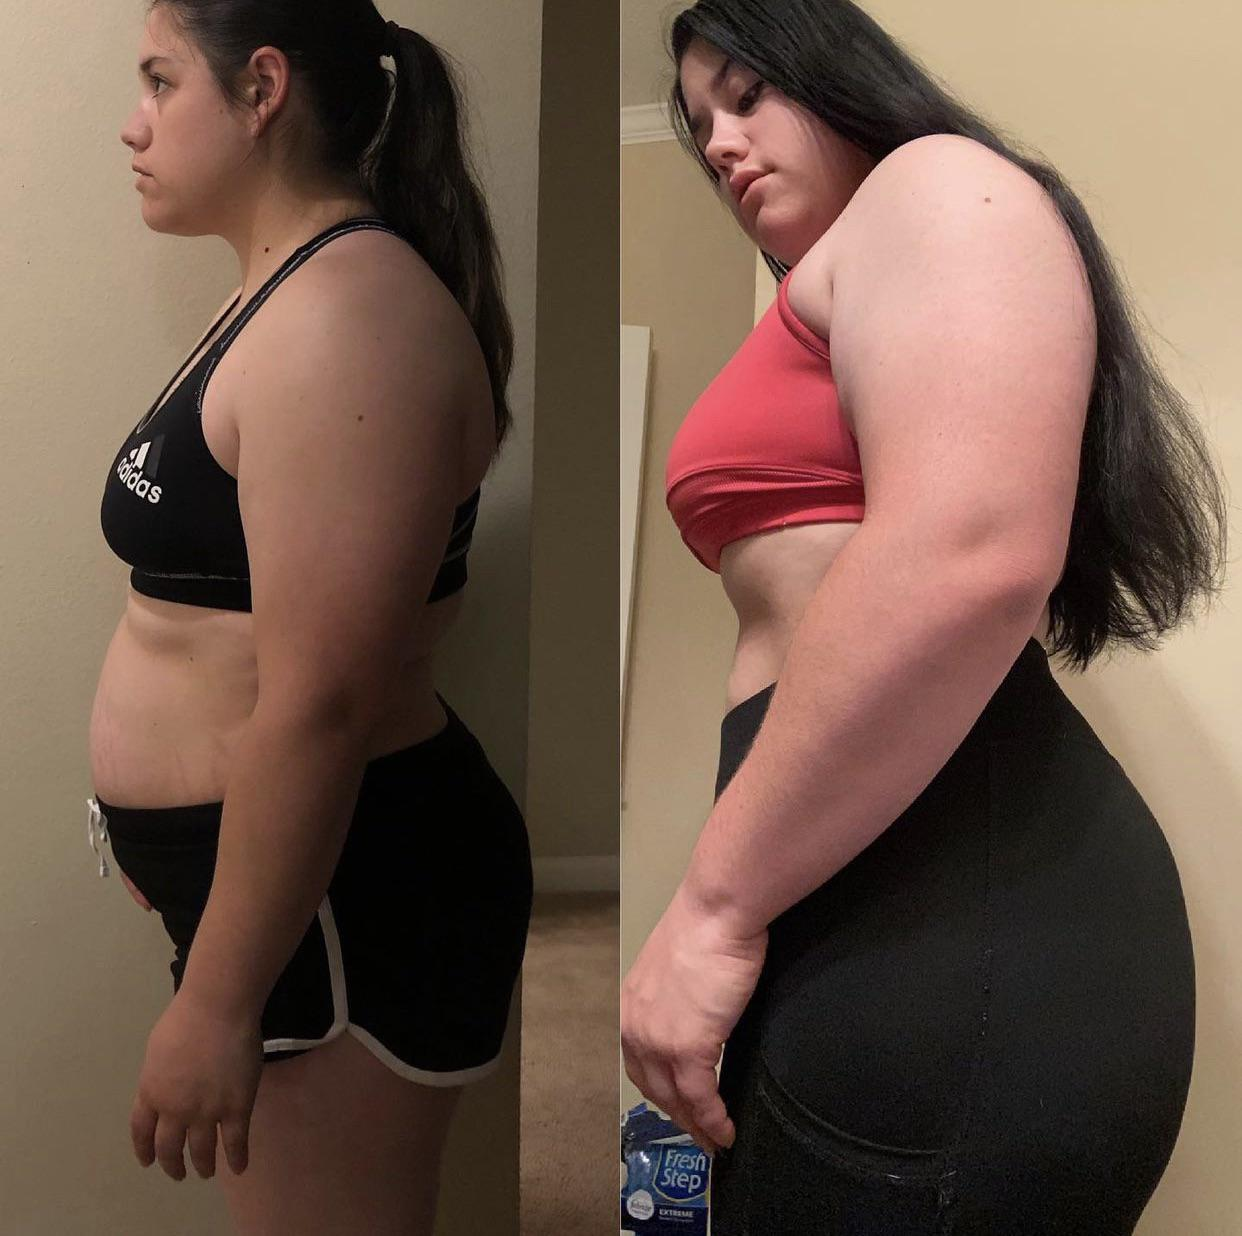 5 feet 4 Female Progress Pics of 30 lbs Weight Loss 190 lbs to 160 lbs